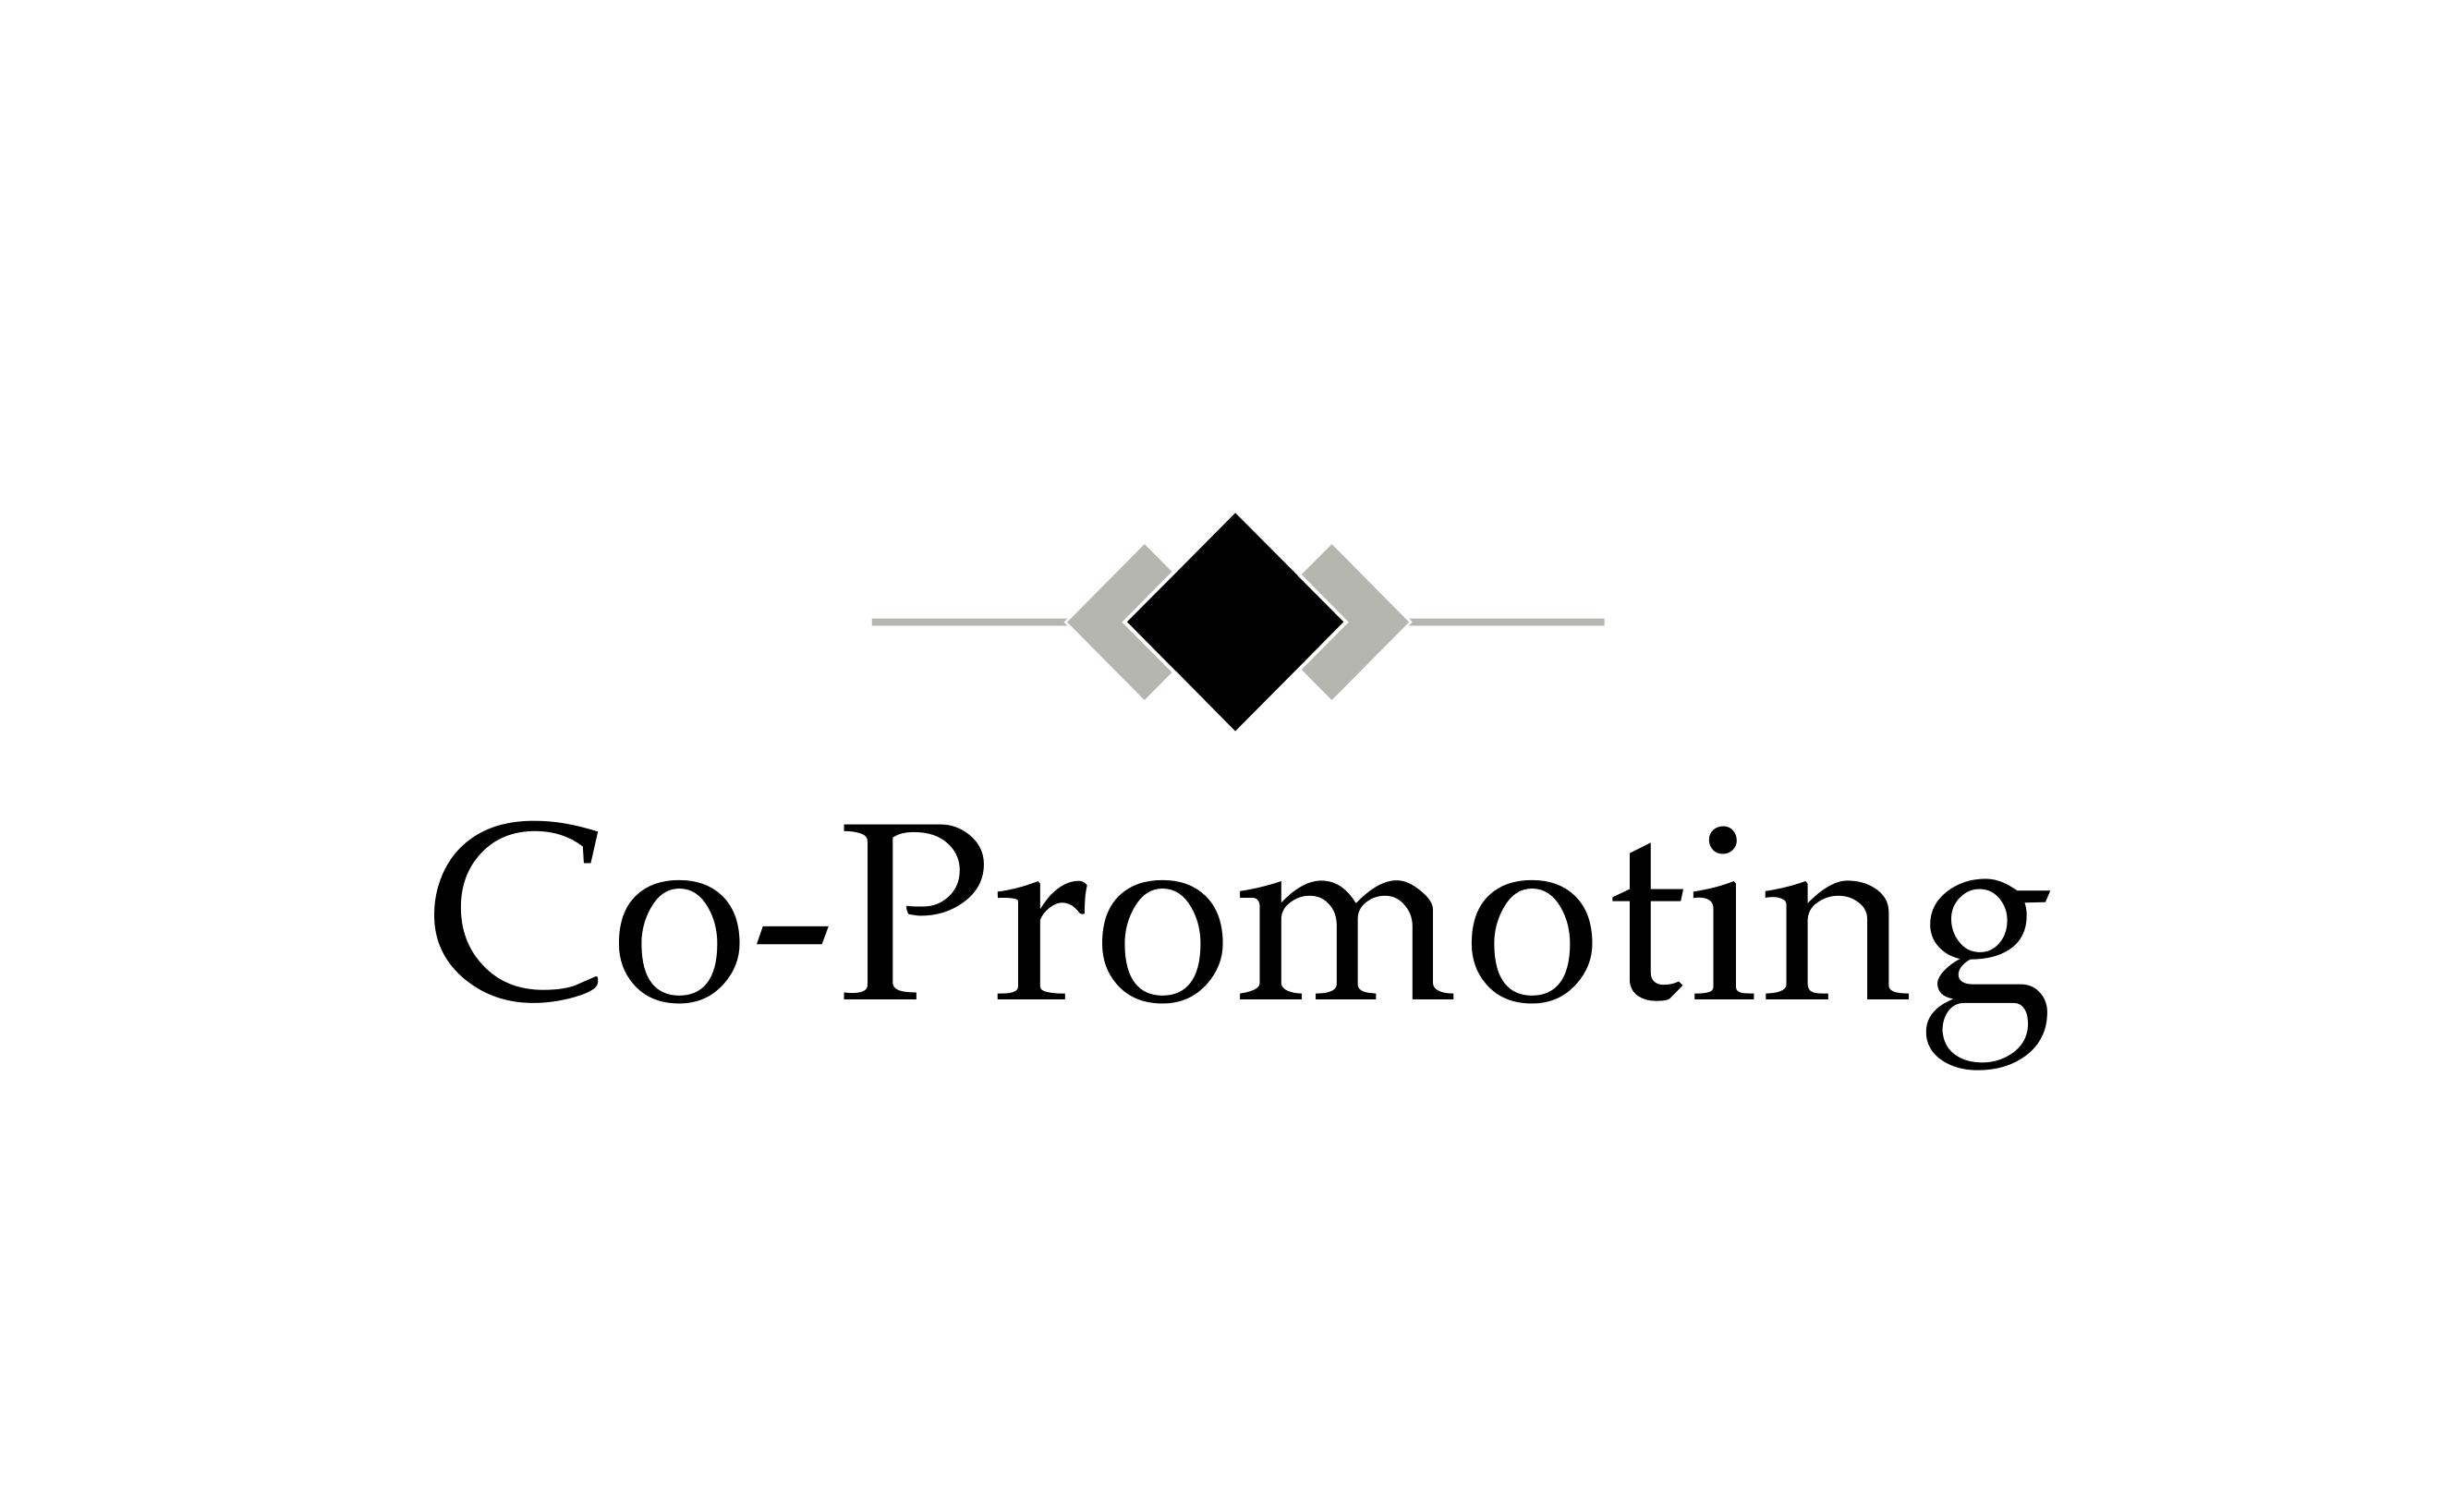 Logo Co-Promoting